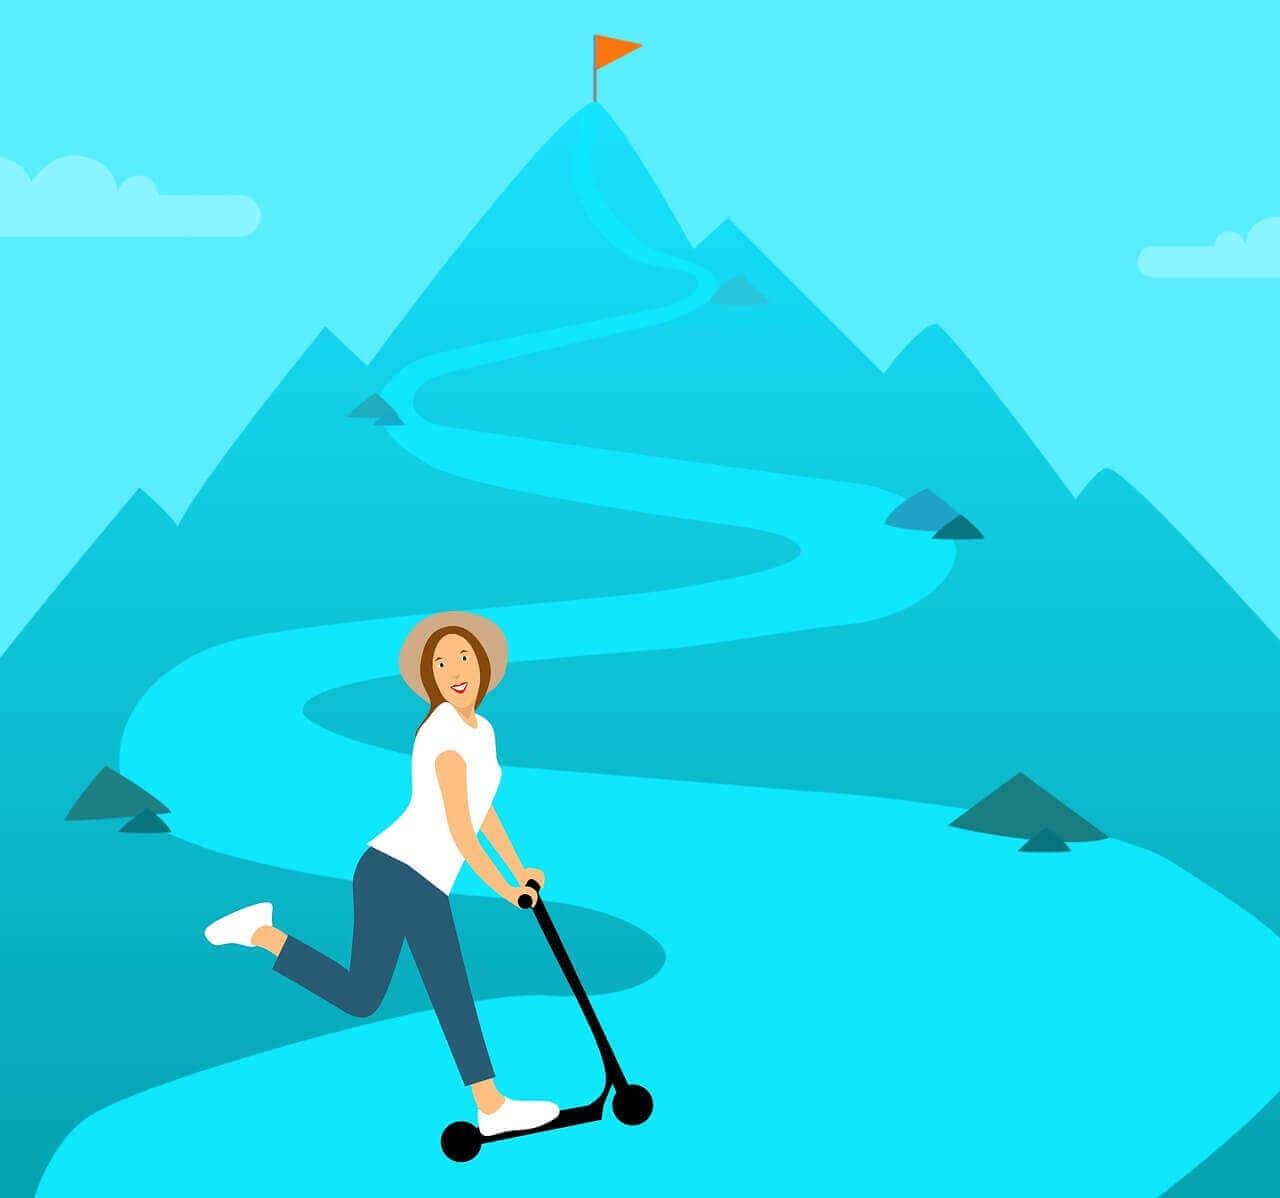 Best razor scooters uphill struggle cartoon